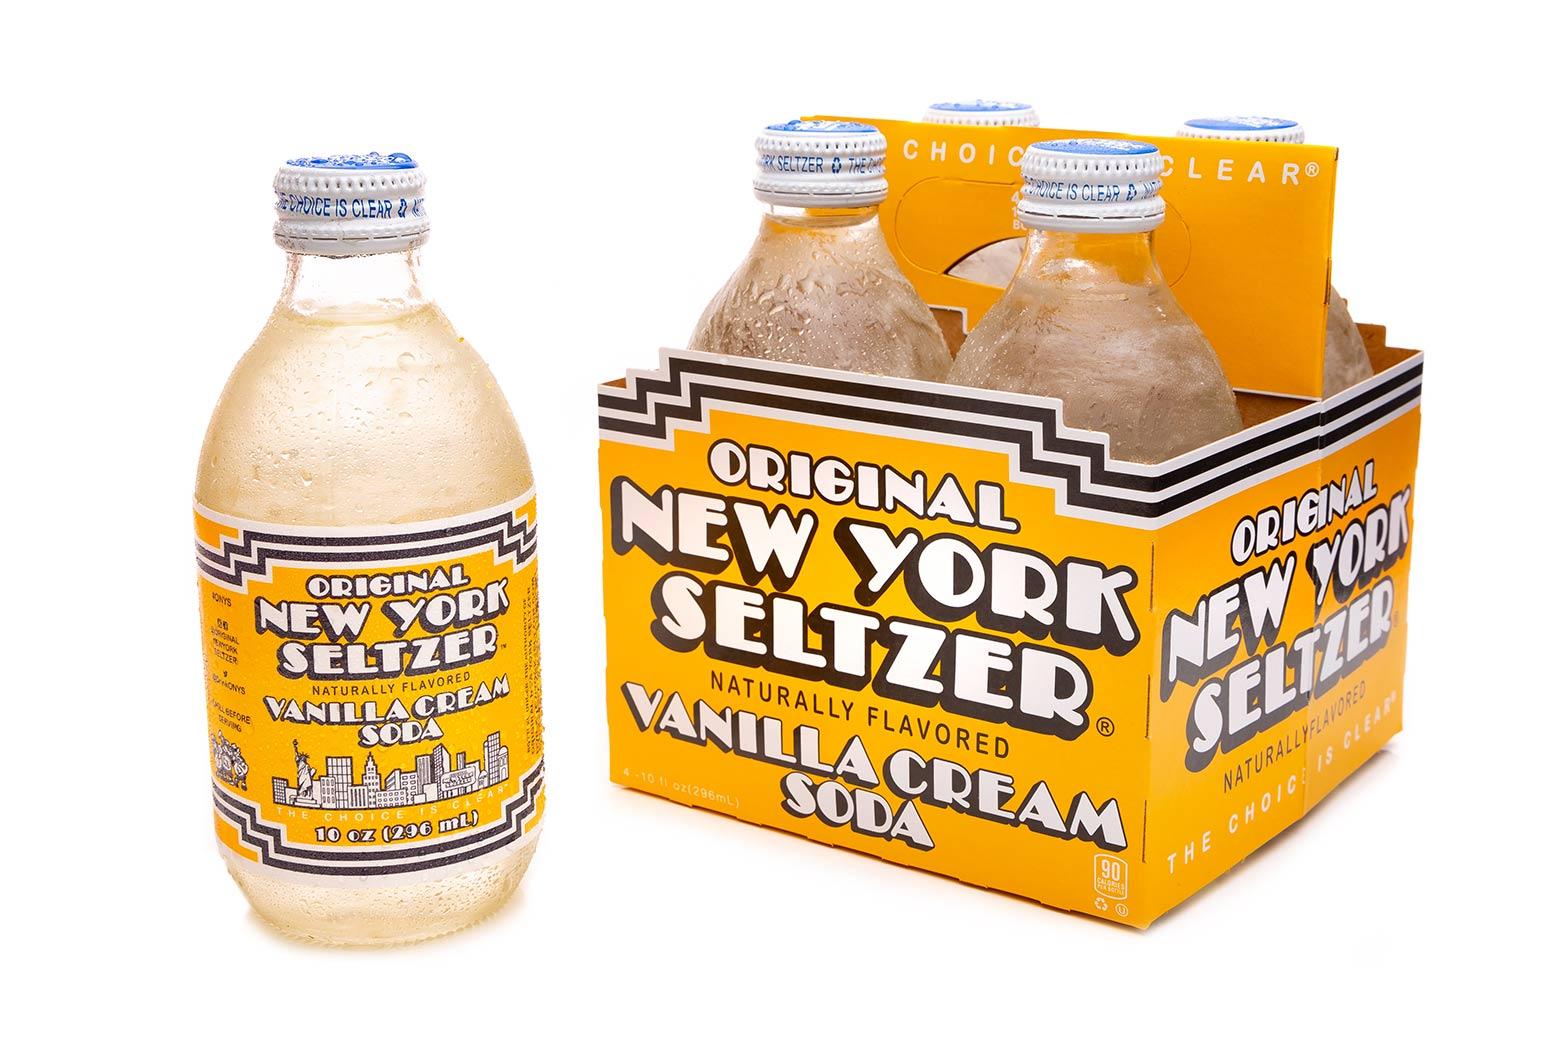 Original New York Seltzer Vanilla Cream 4-pack carrier with bottle